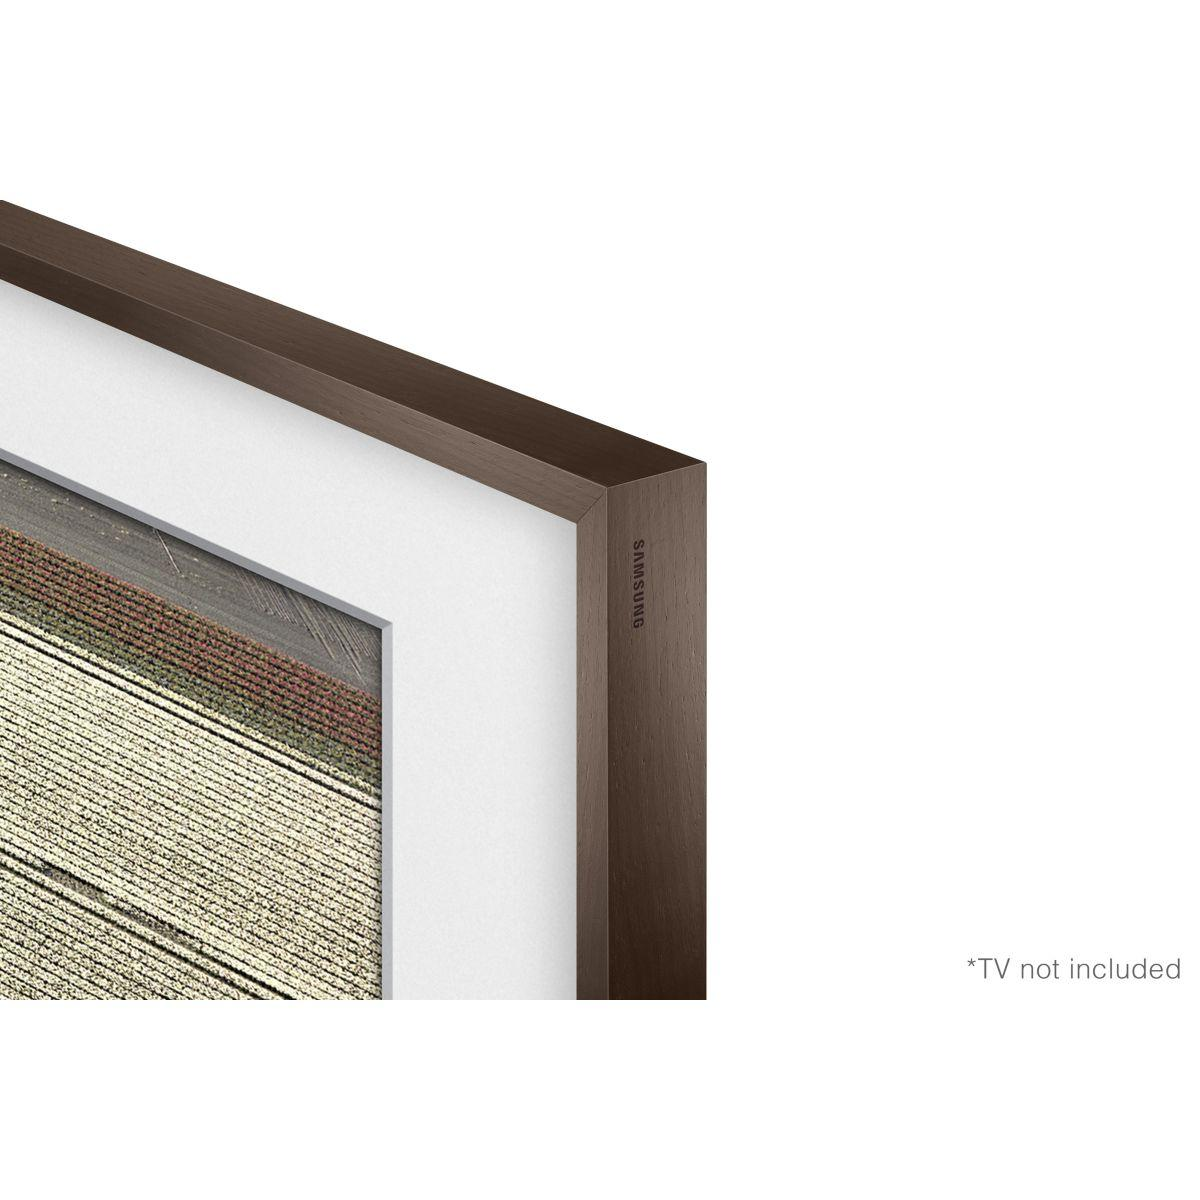 Cadre the frame samsung cadre vg-scfm55dw the frame dark wood - 10% de remise imm�diate